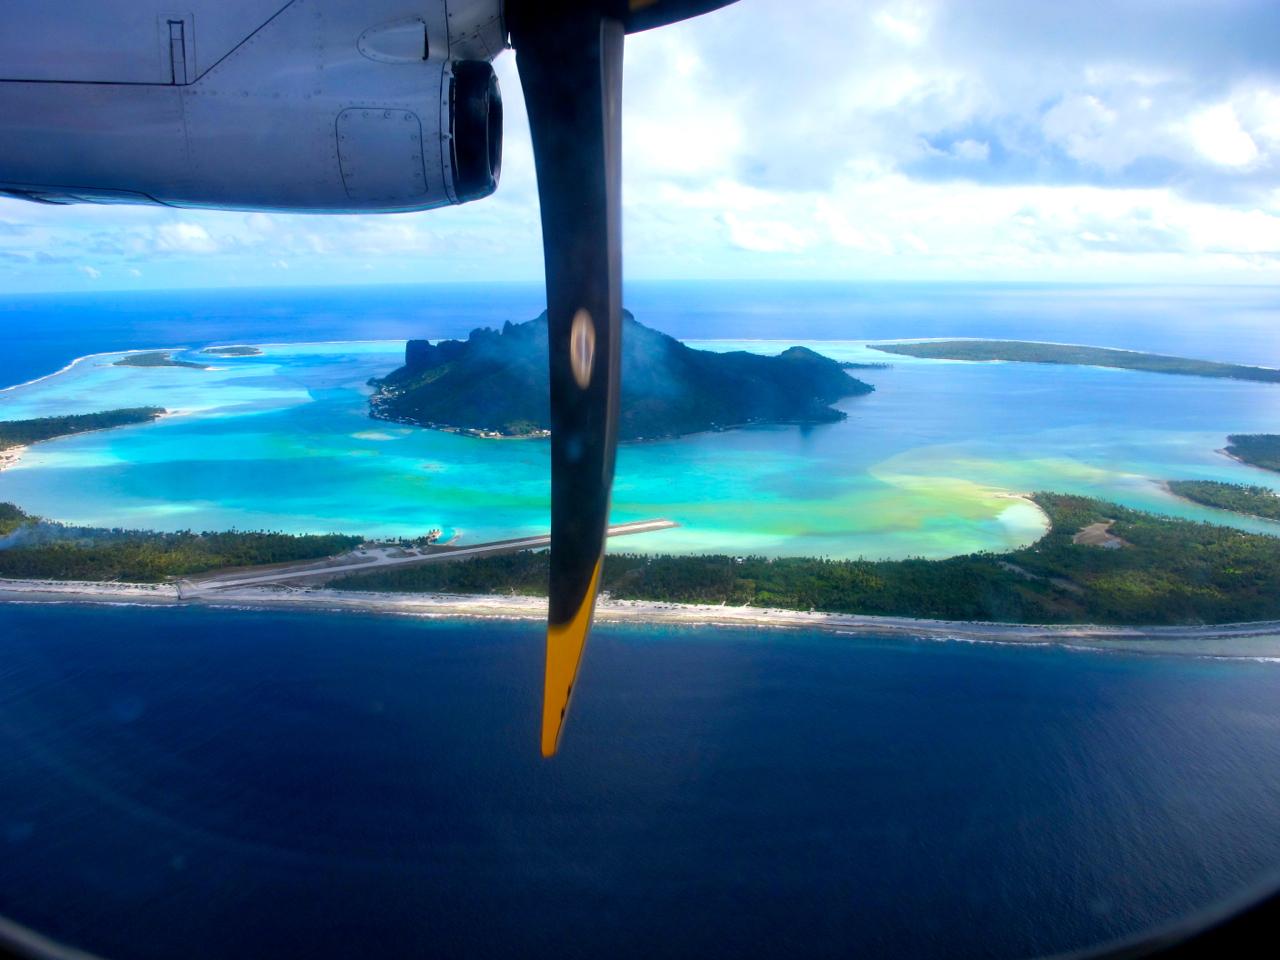 Bora Bora aerial photograph 1